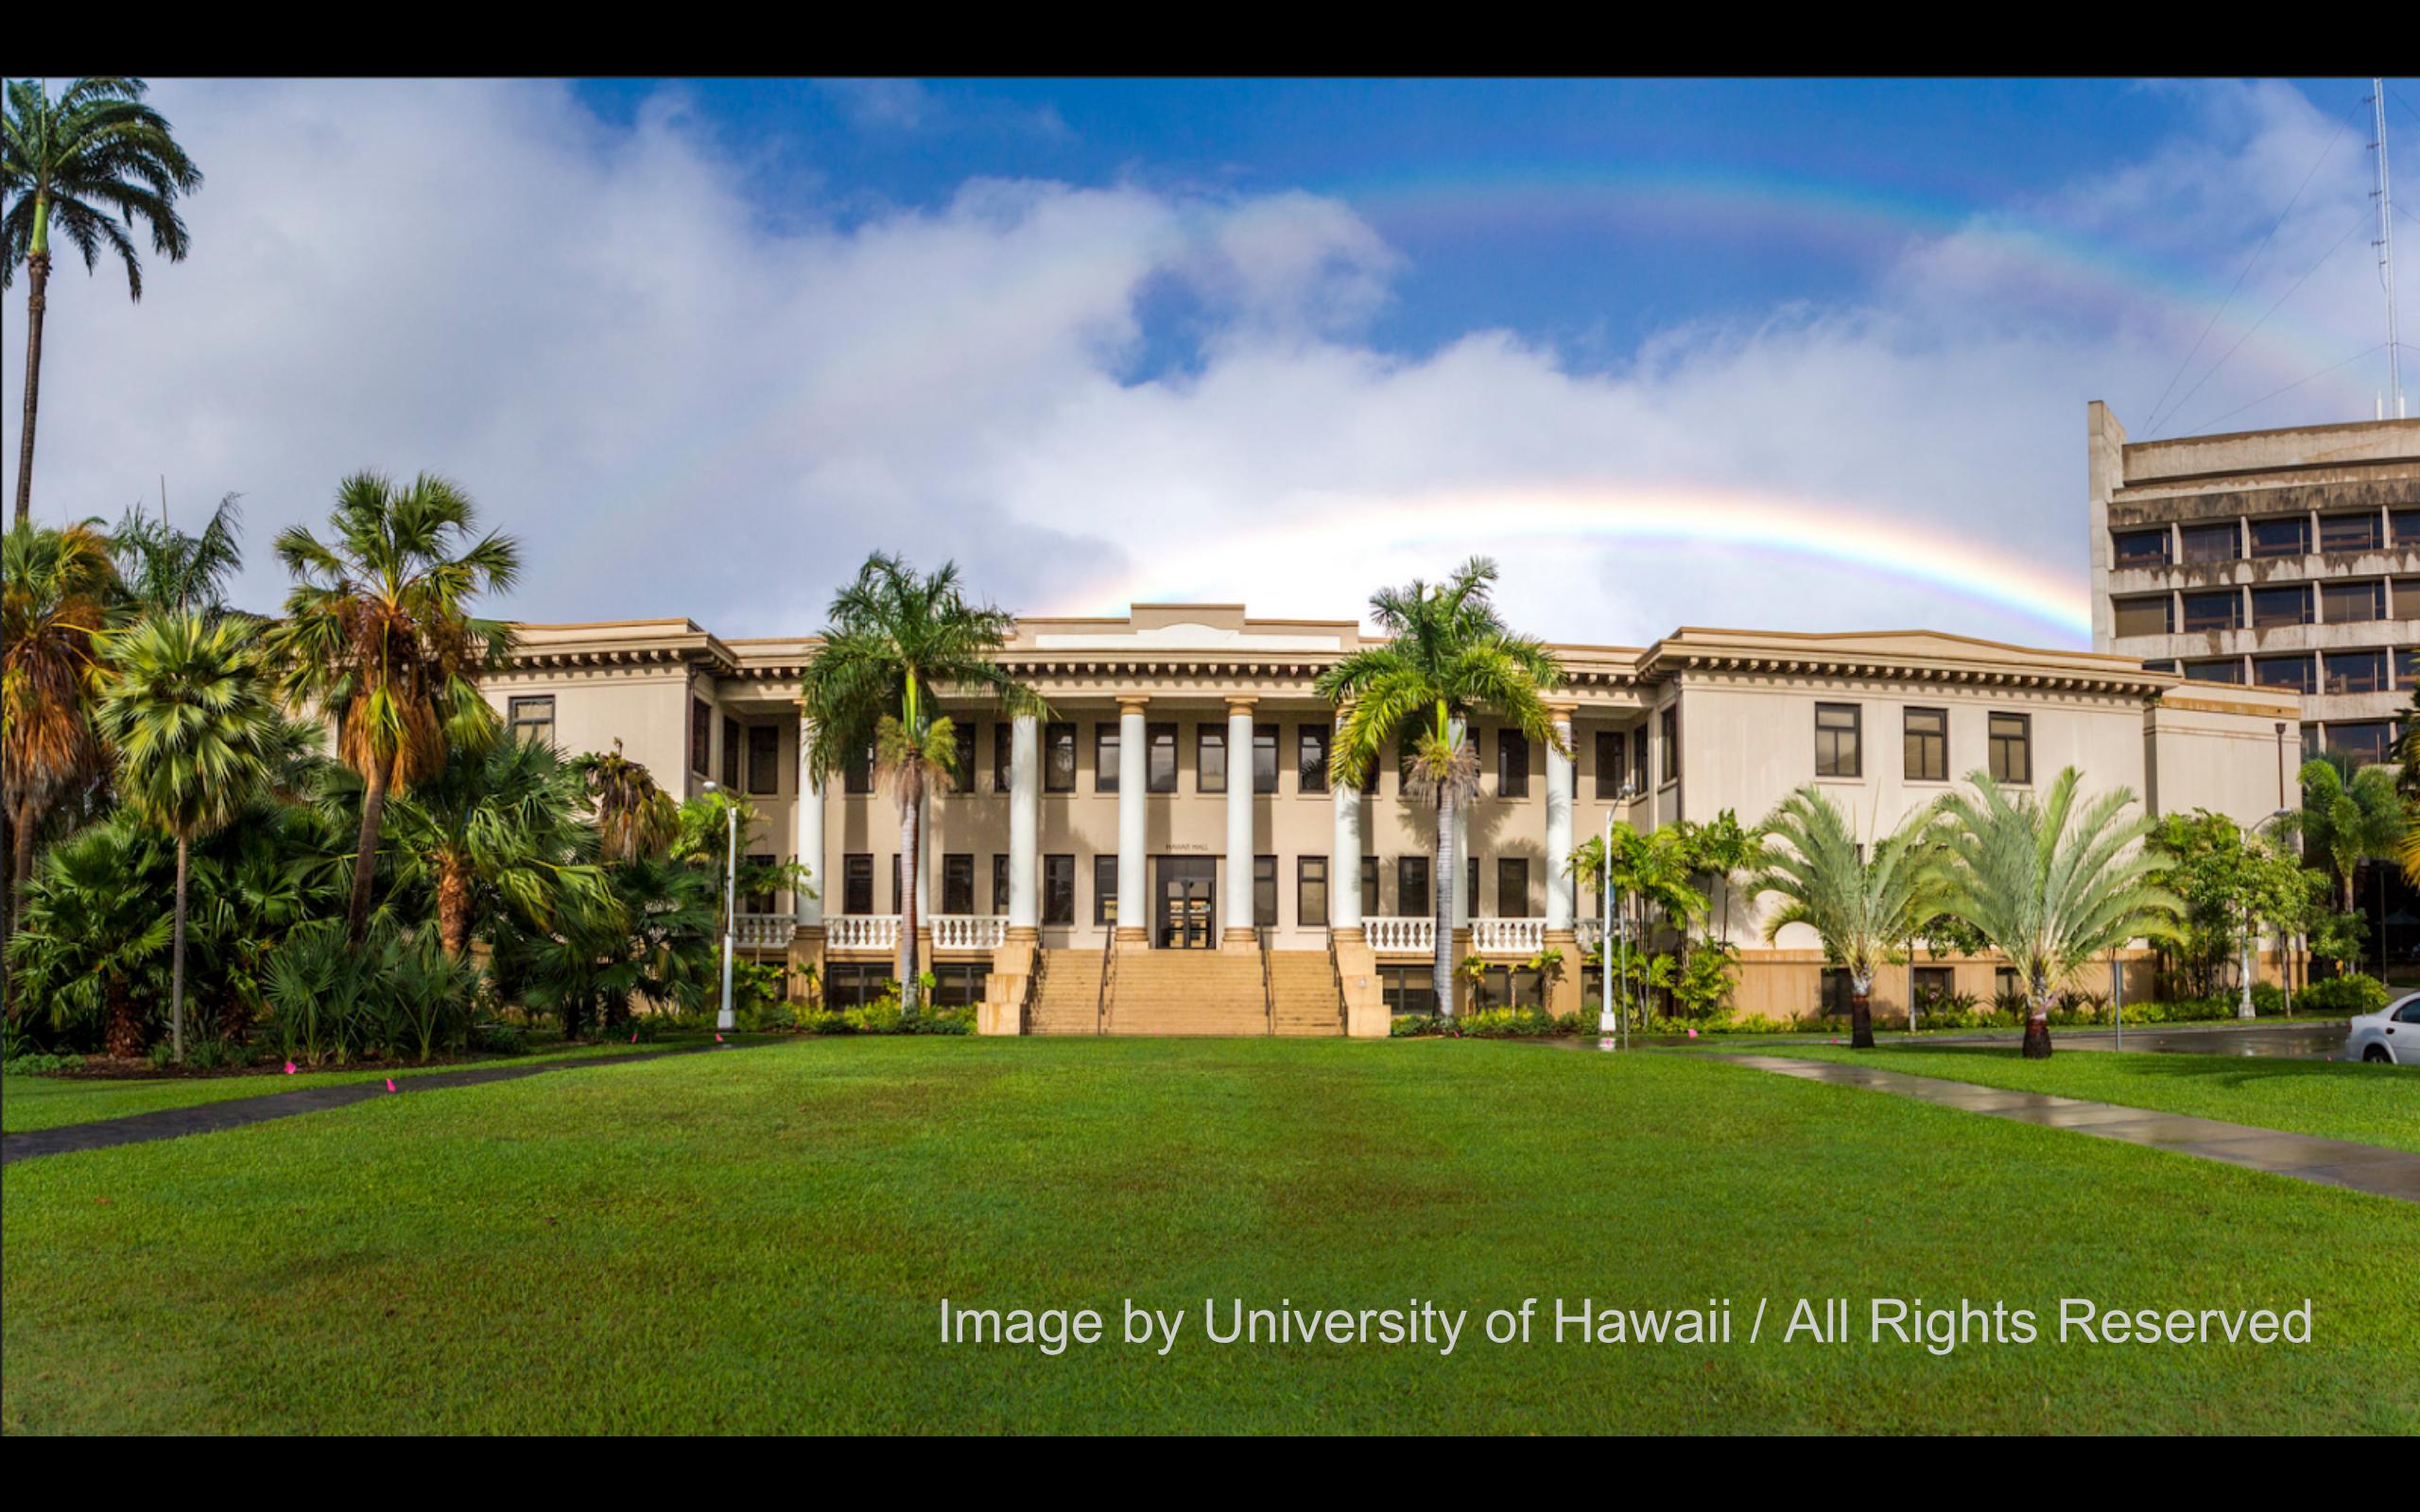 Say Aloha: Southwest Flights to Hawaii Are Now on Sale